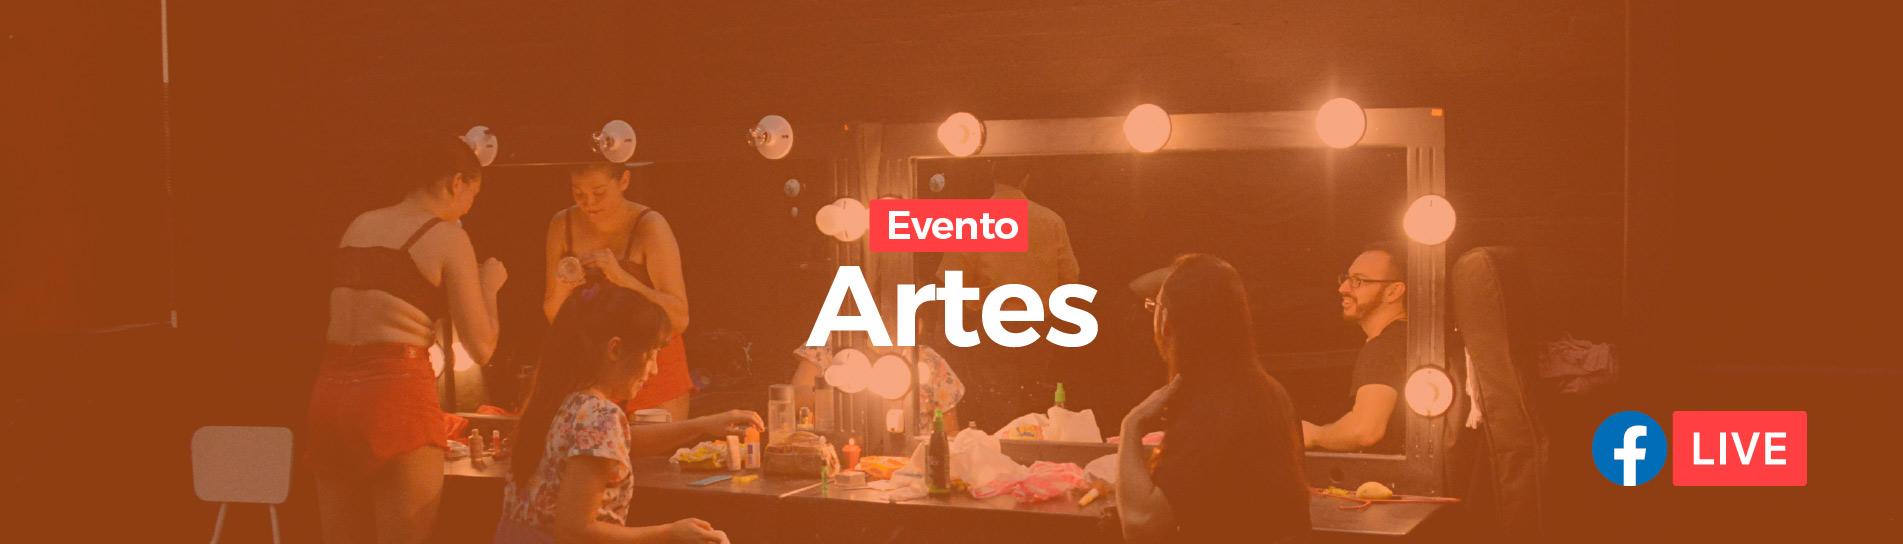 Banners Micrositiofvevento Artes